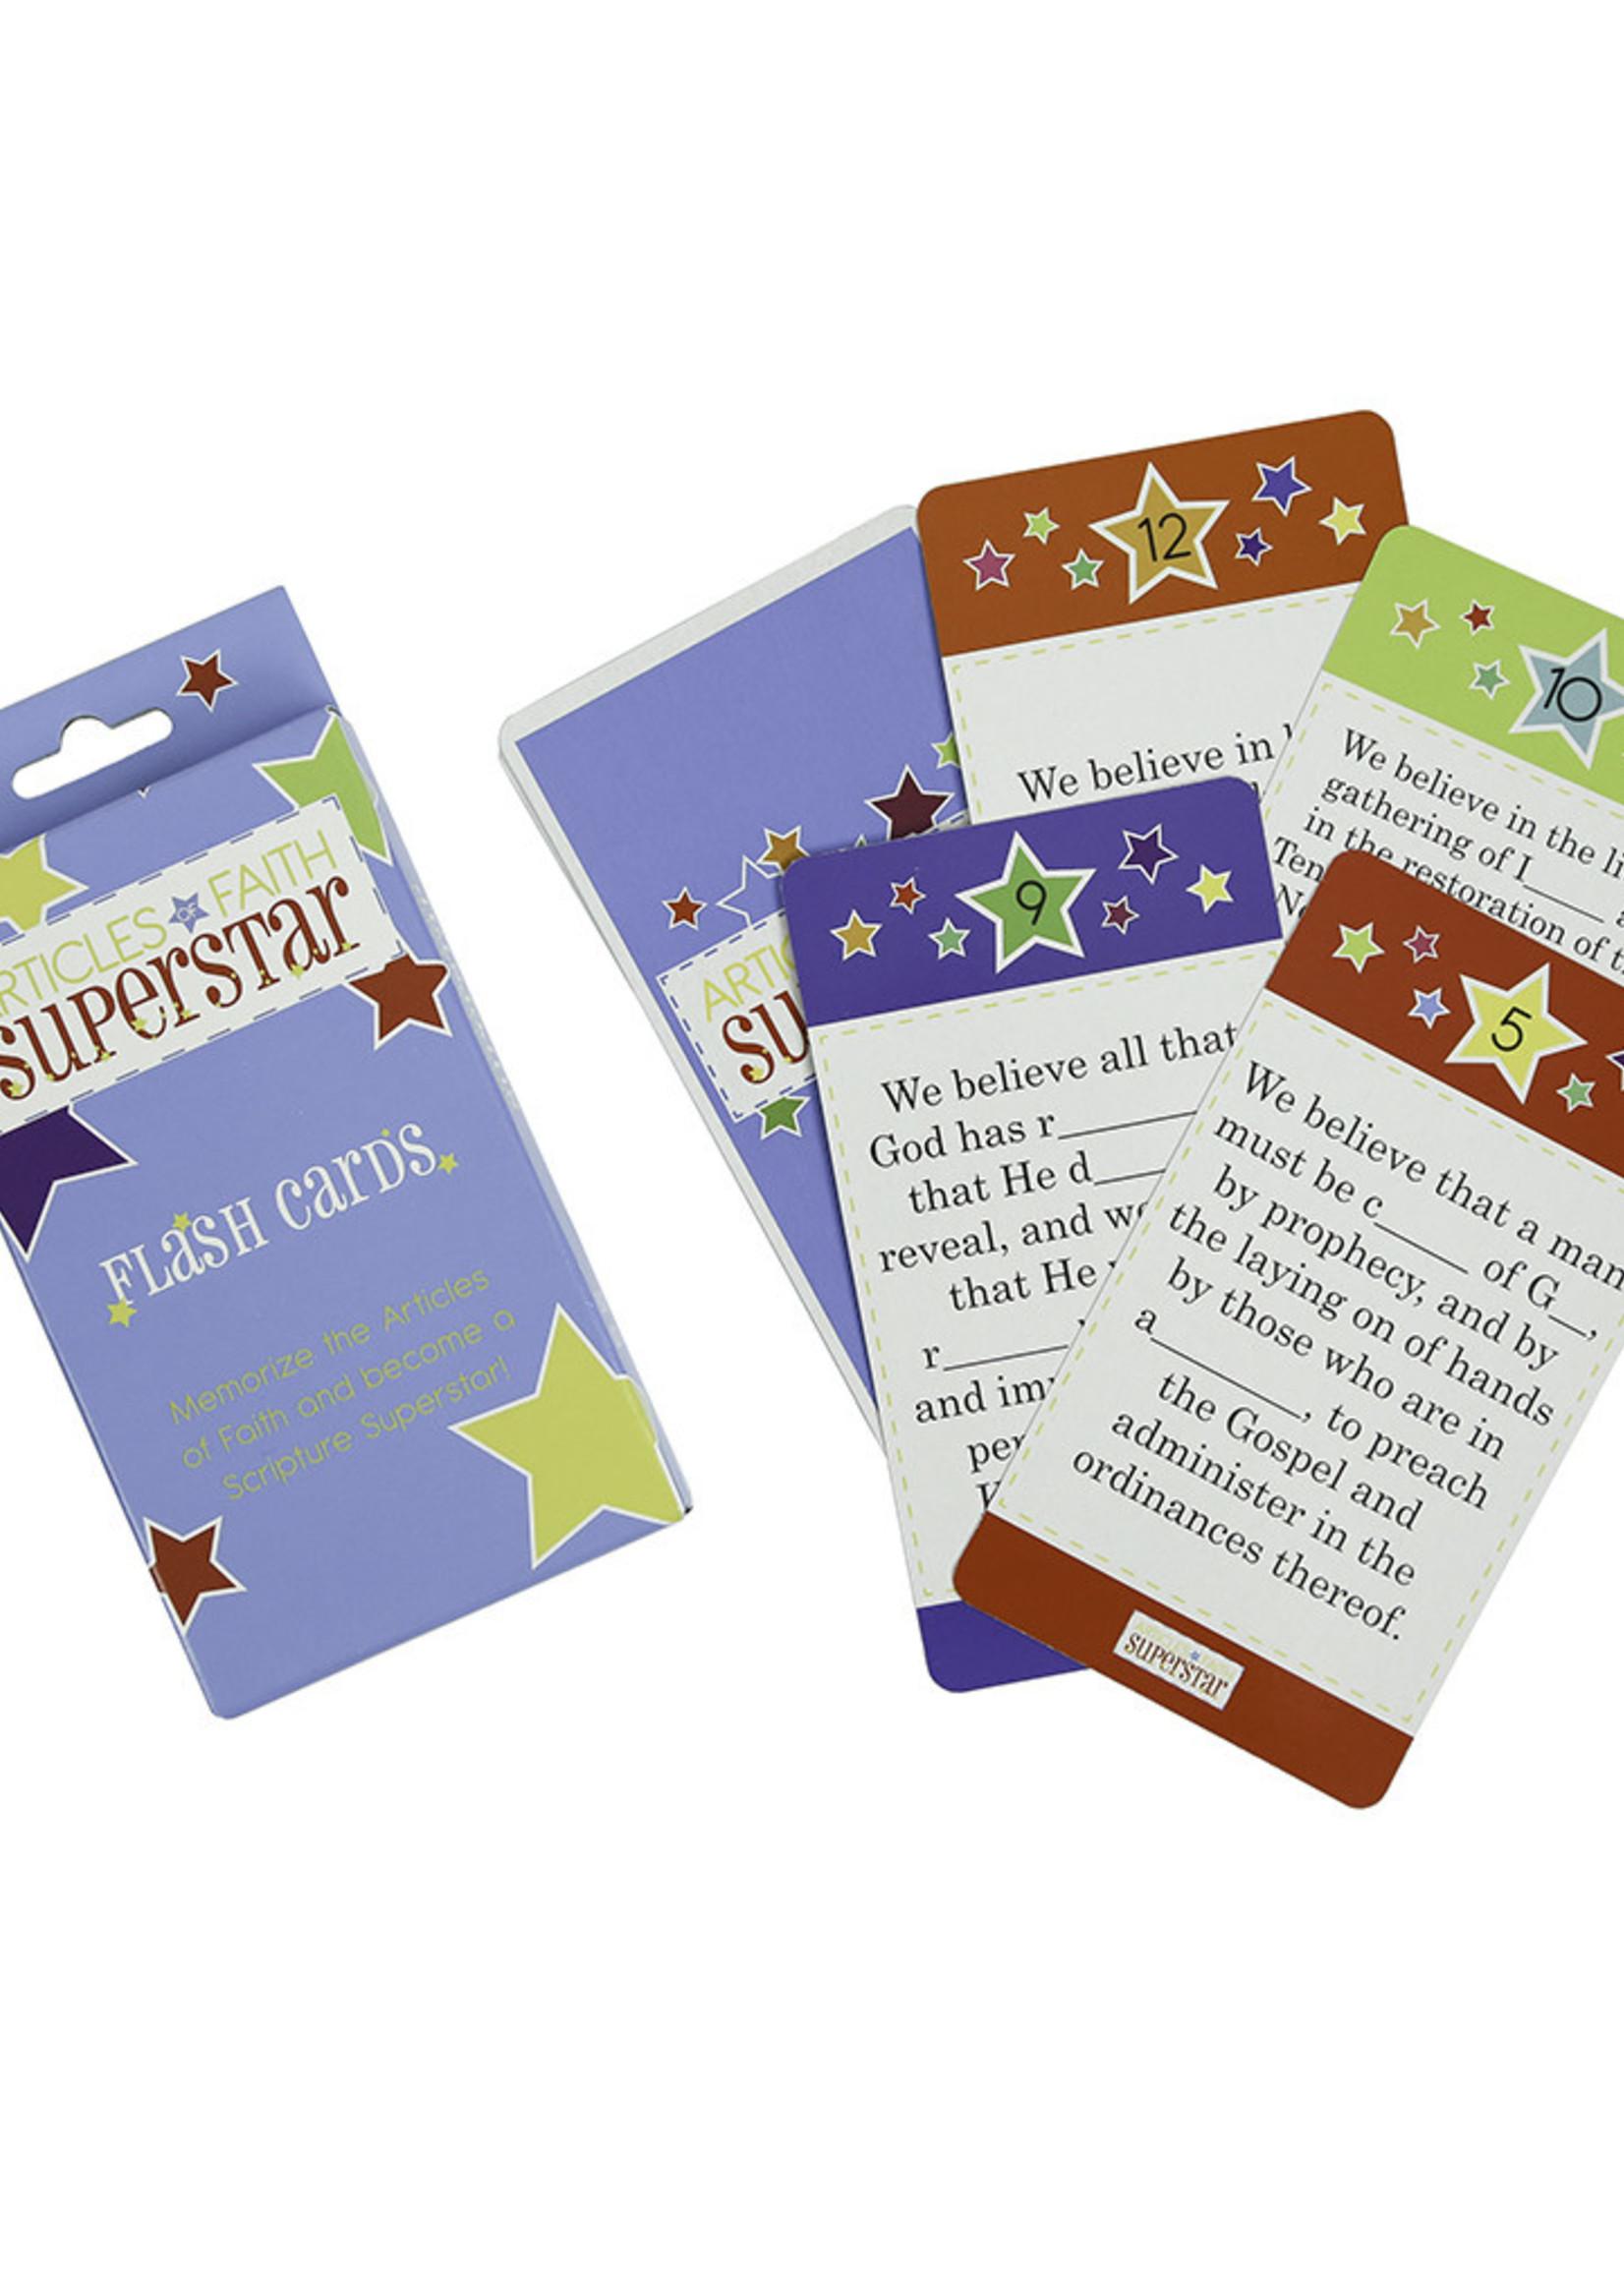 ARTICLES OF FAITH SUPERSTAR FLASH CARDS